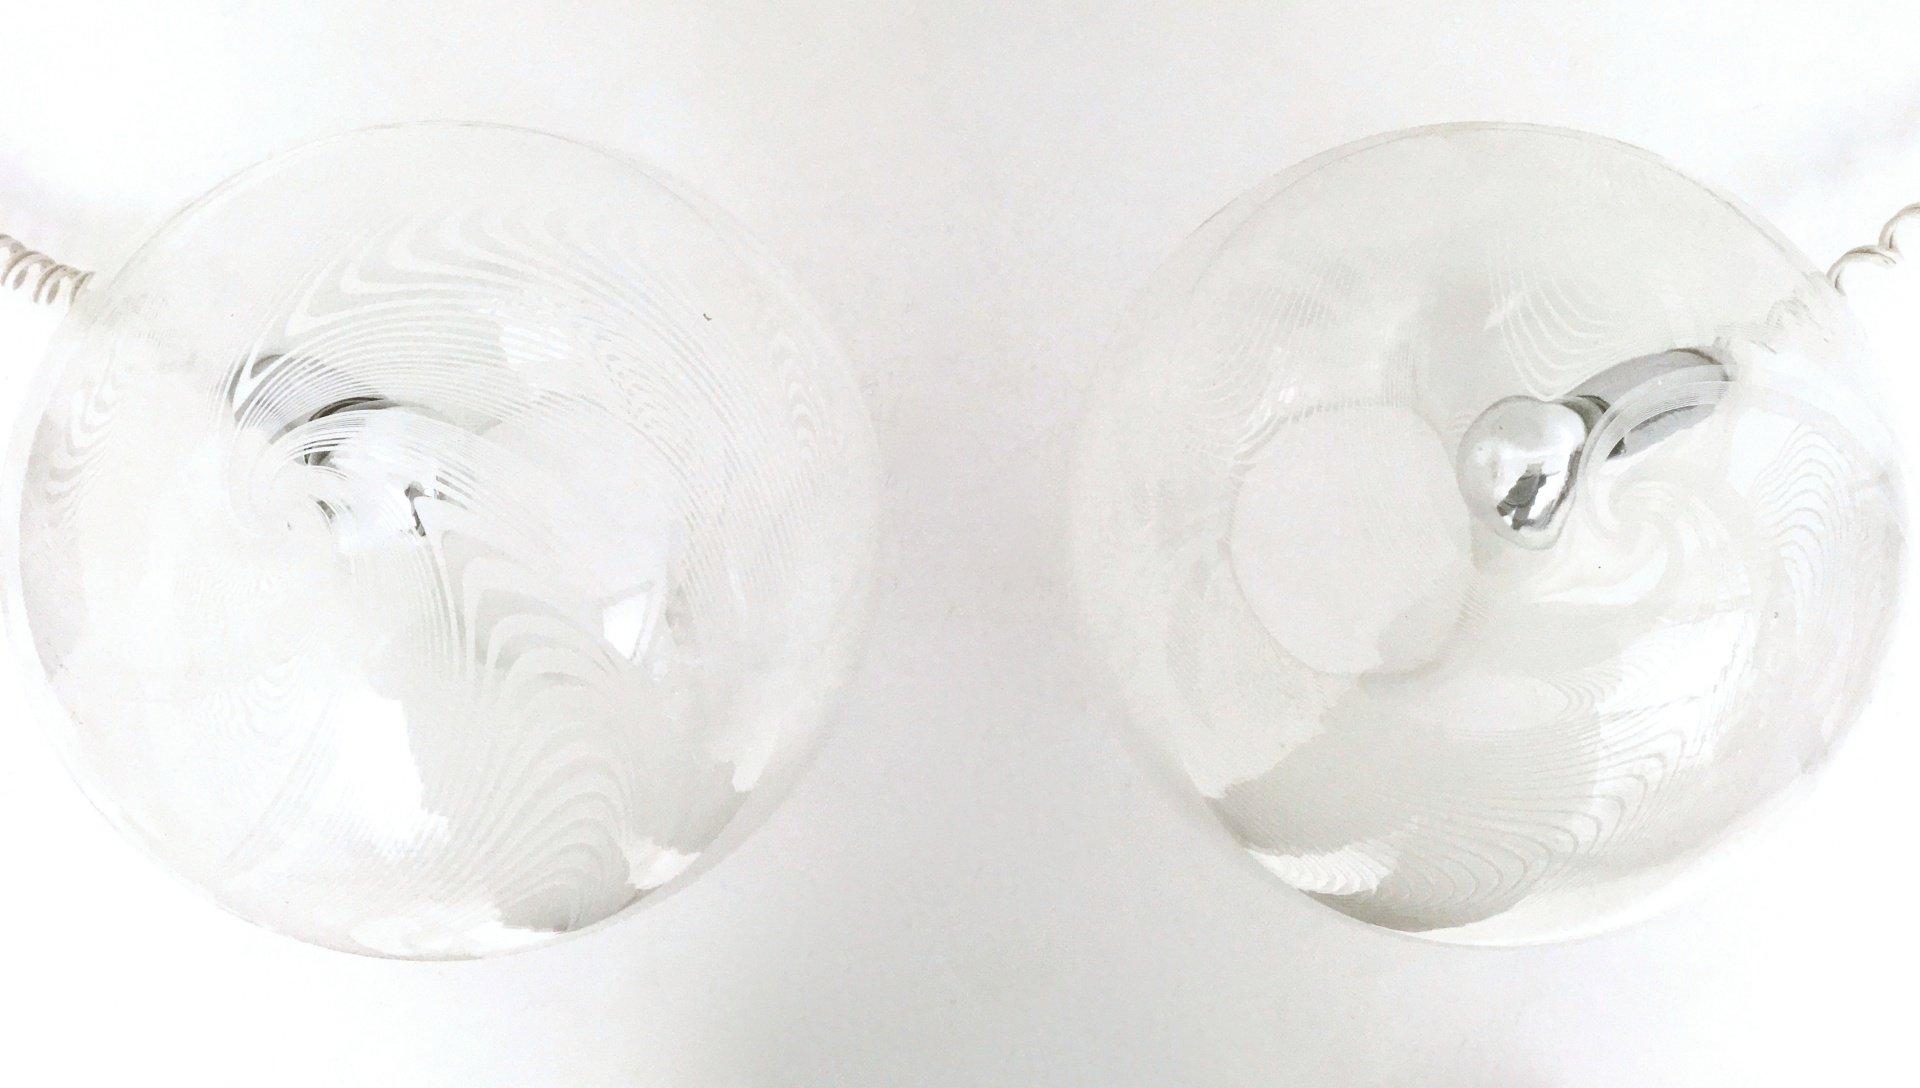 runde tischlampen aus mundgeblasenem glas 1970er 2er set bei pamono kaufen. Black Bedroom Furniture Sets. Home Design Ideas